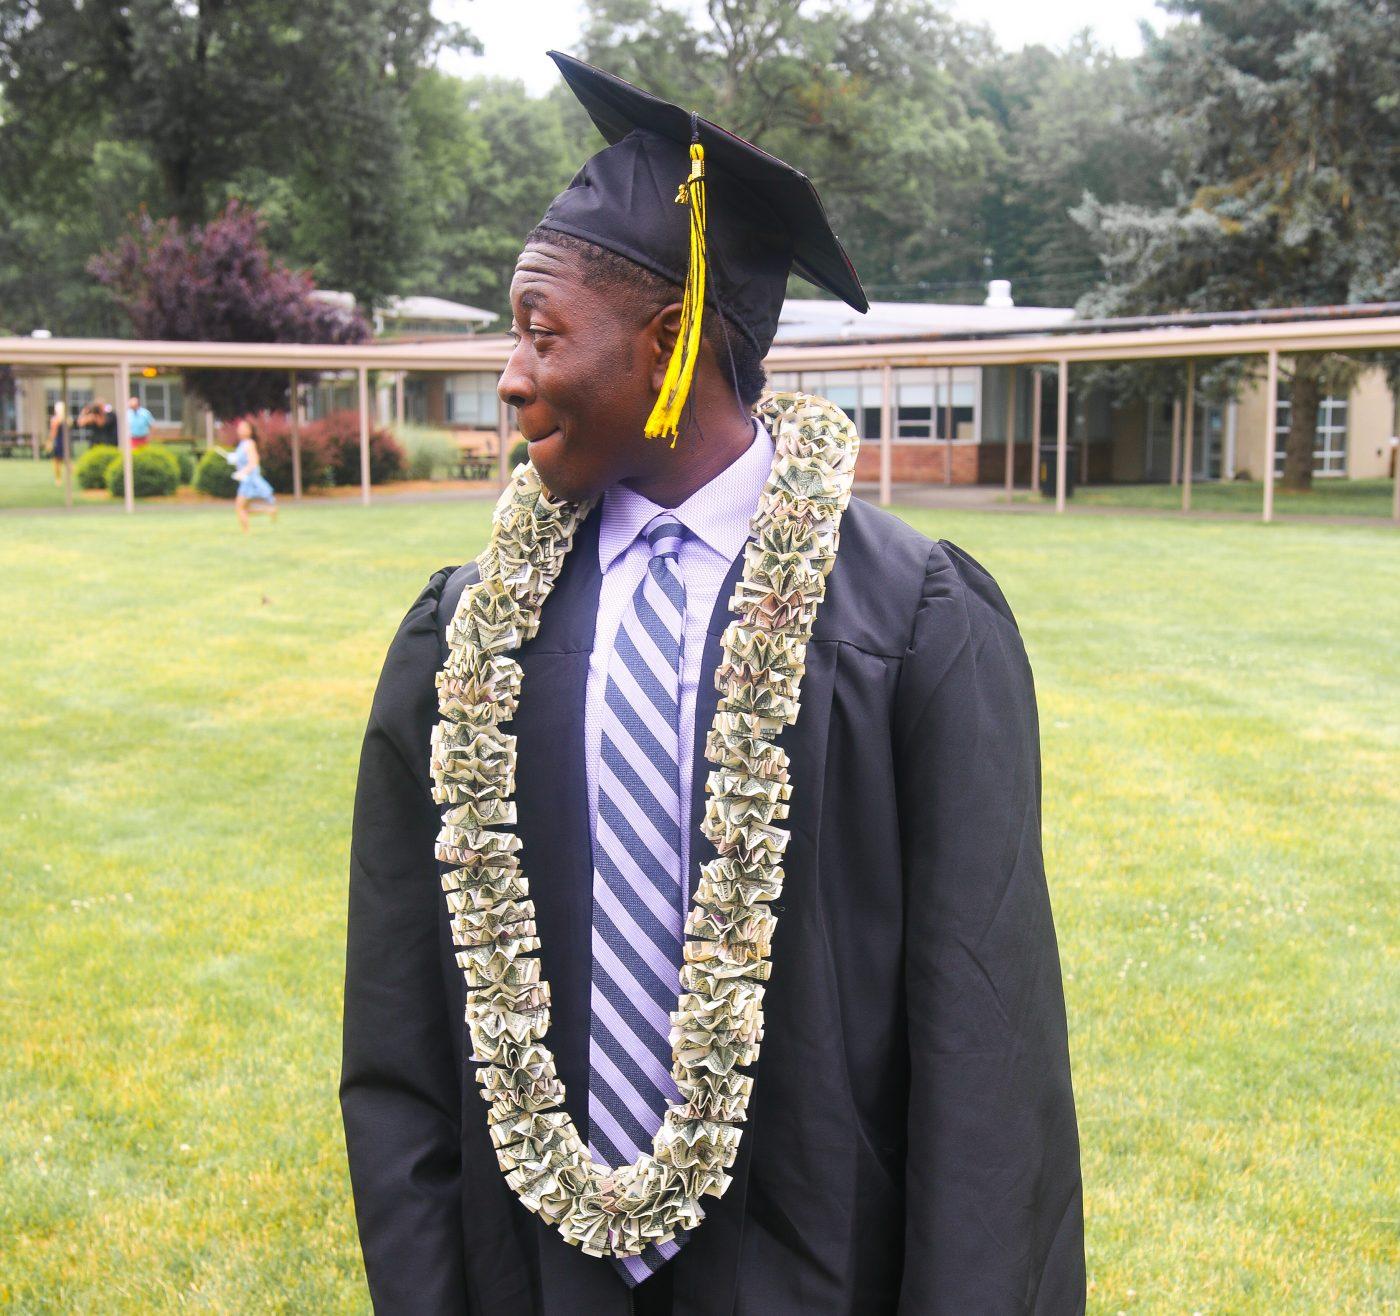 Professional Graduation Attendee!